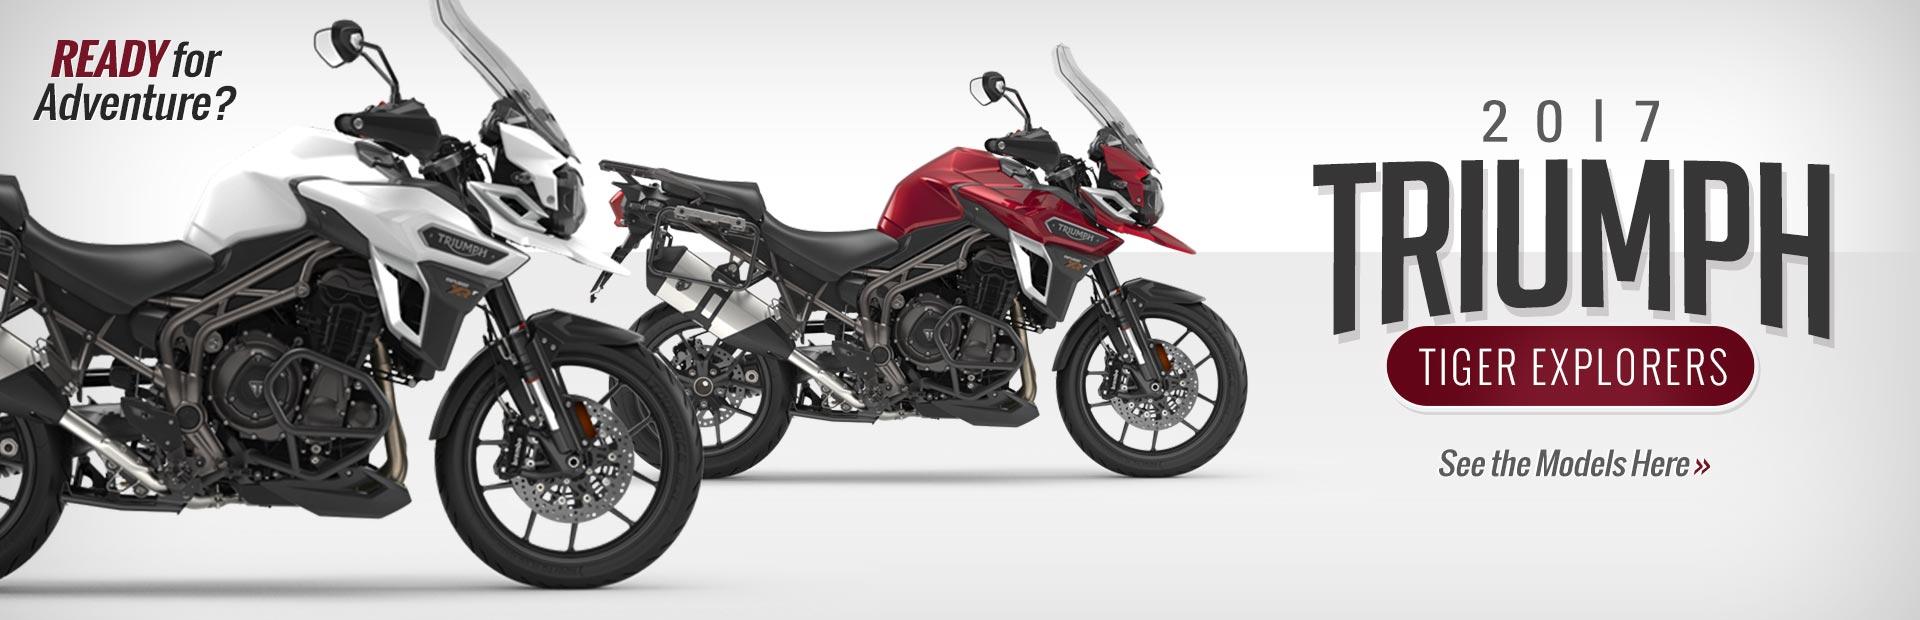 honda motorcycle 0 finance deals | sugakiya motor